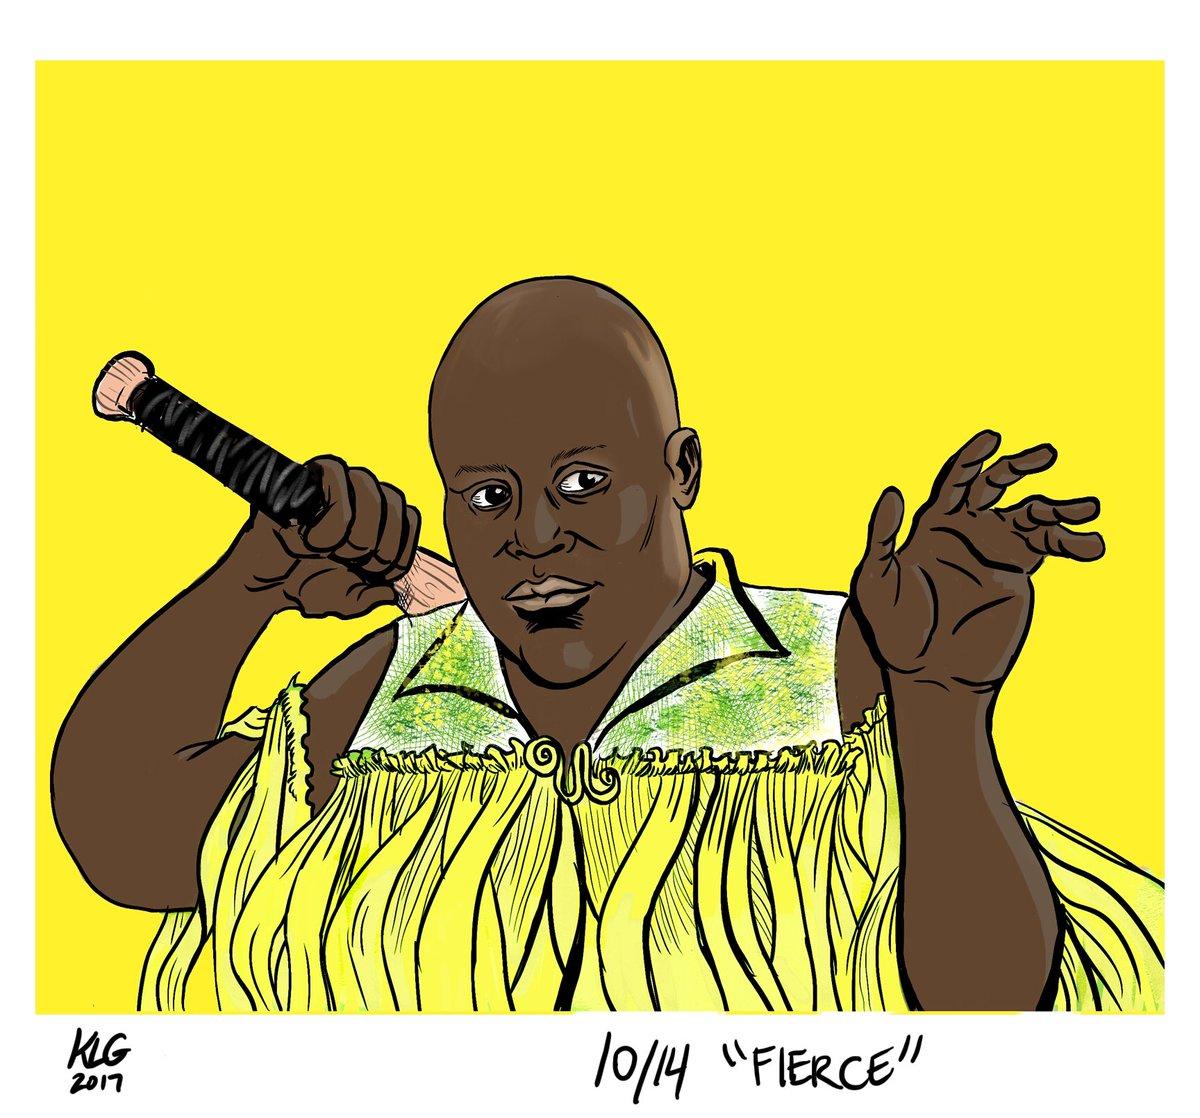 #inktober Day 14 - &quot;Fierce&quot; - falling behind again  #titusandromedon #lemonading #inktober2017 #unbreakablekimmyschmidt <br>http://pic.twitter.com/UcHEDlZ7SR